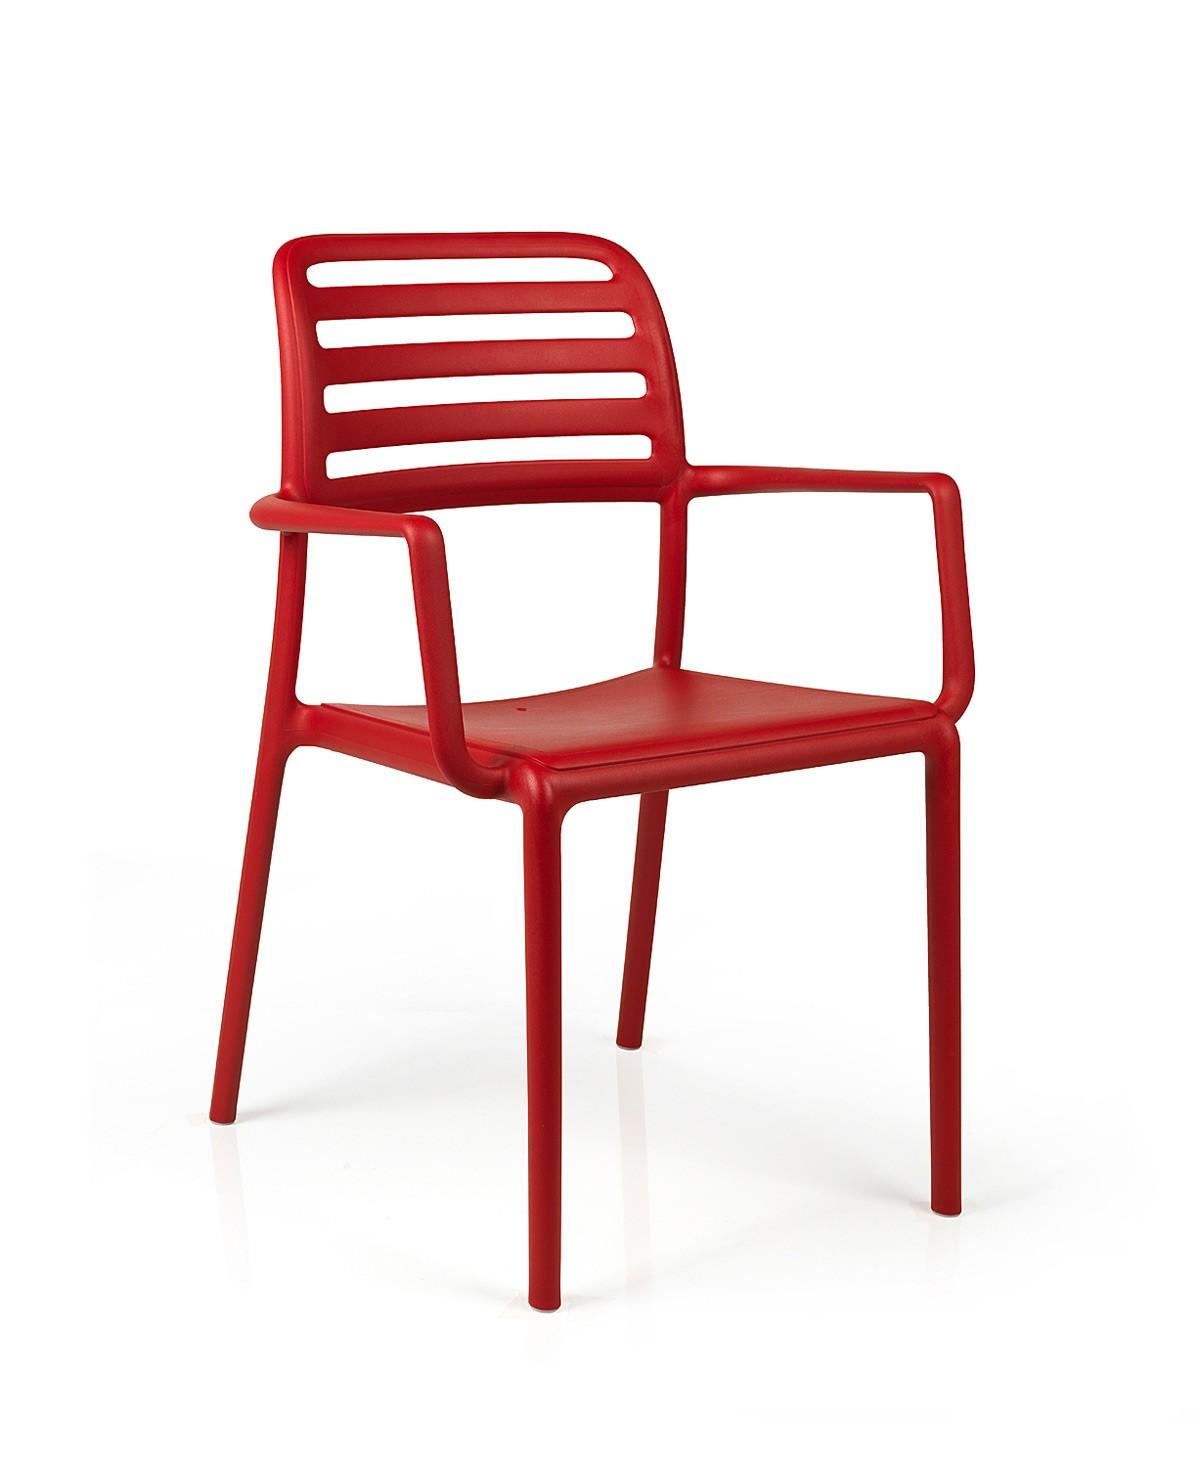 Kunststoff Stühle Stapelbar : stapelstuhl gartenstuhl costa kunststoff stapelbar rot bei ~ Indierocktalk.com Haus und Dekorationen